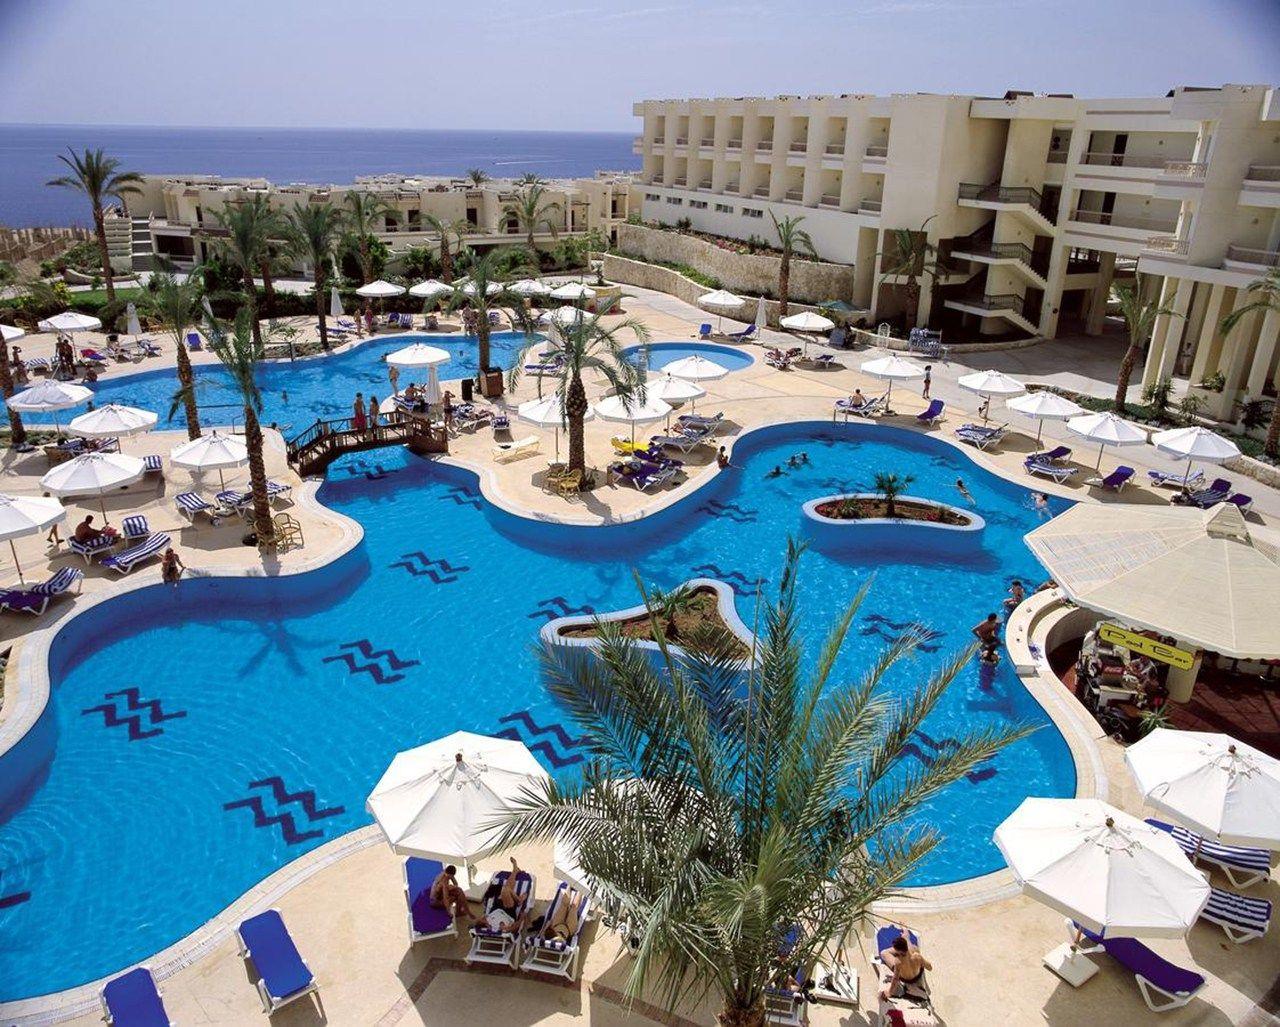 Hilton Is Bringing Back Its Double Points Promotion Resort Sharm El Sheikh Egypt